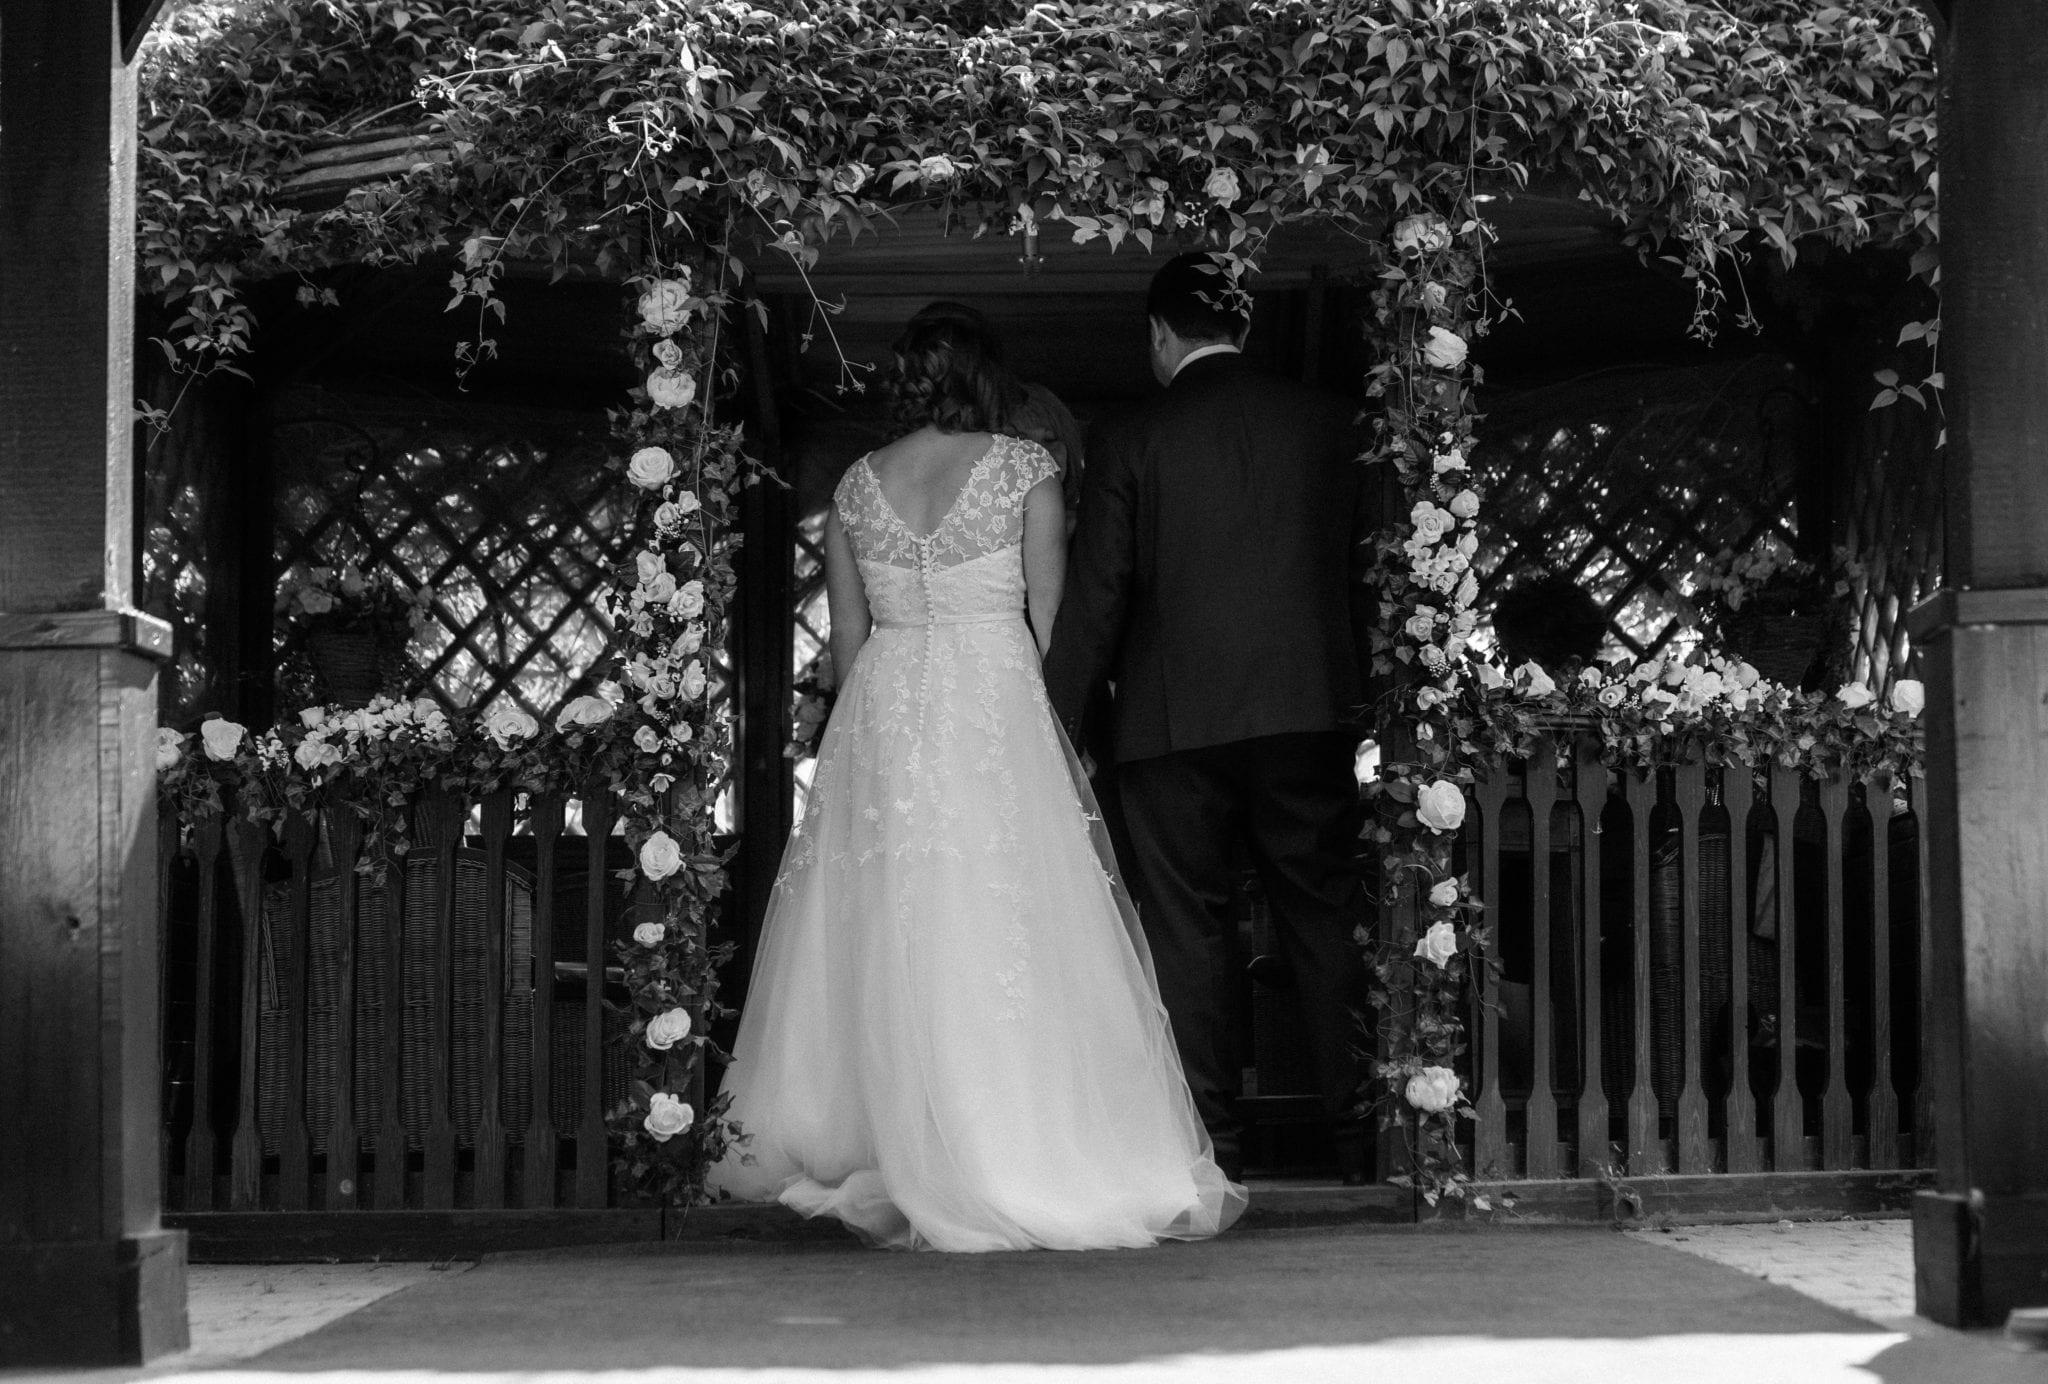 Documentary Wedding Photography - Couple